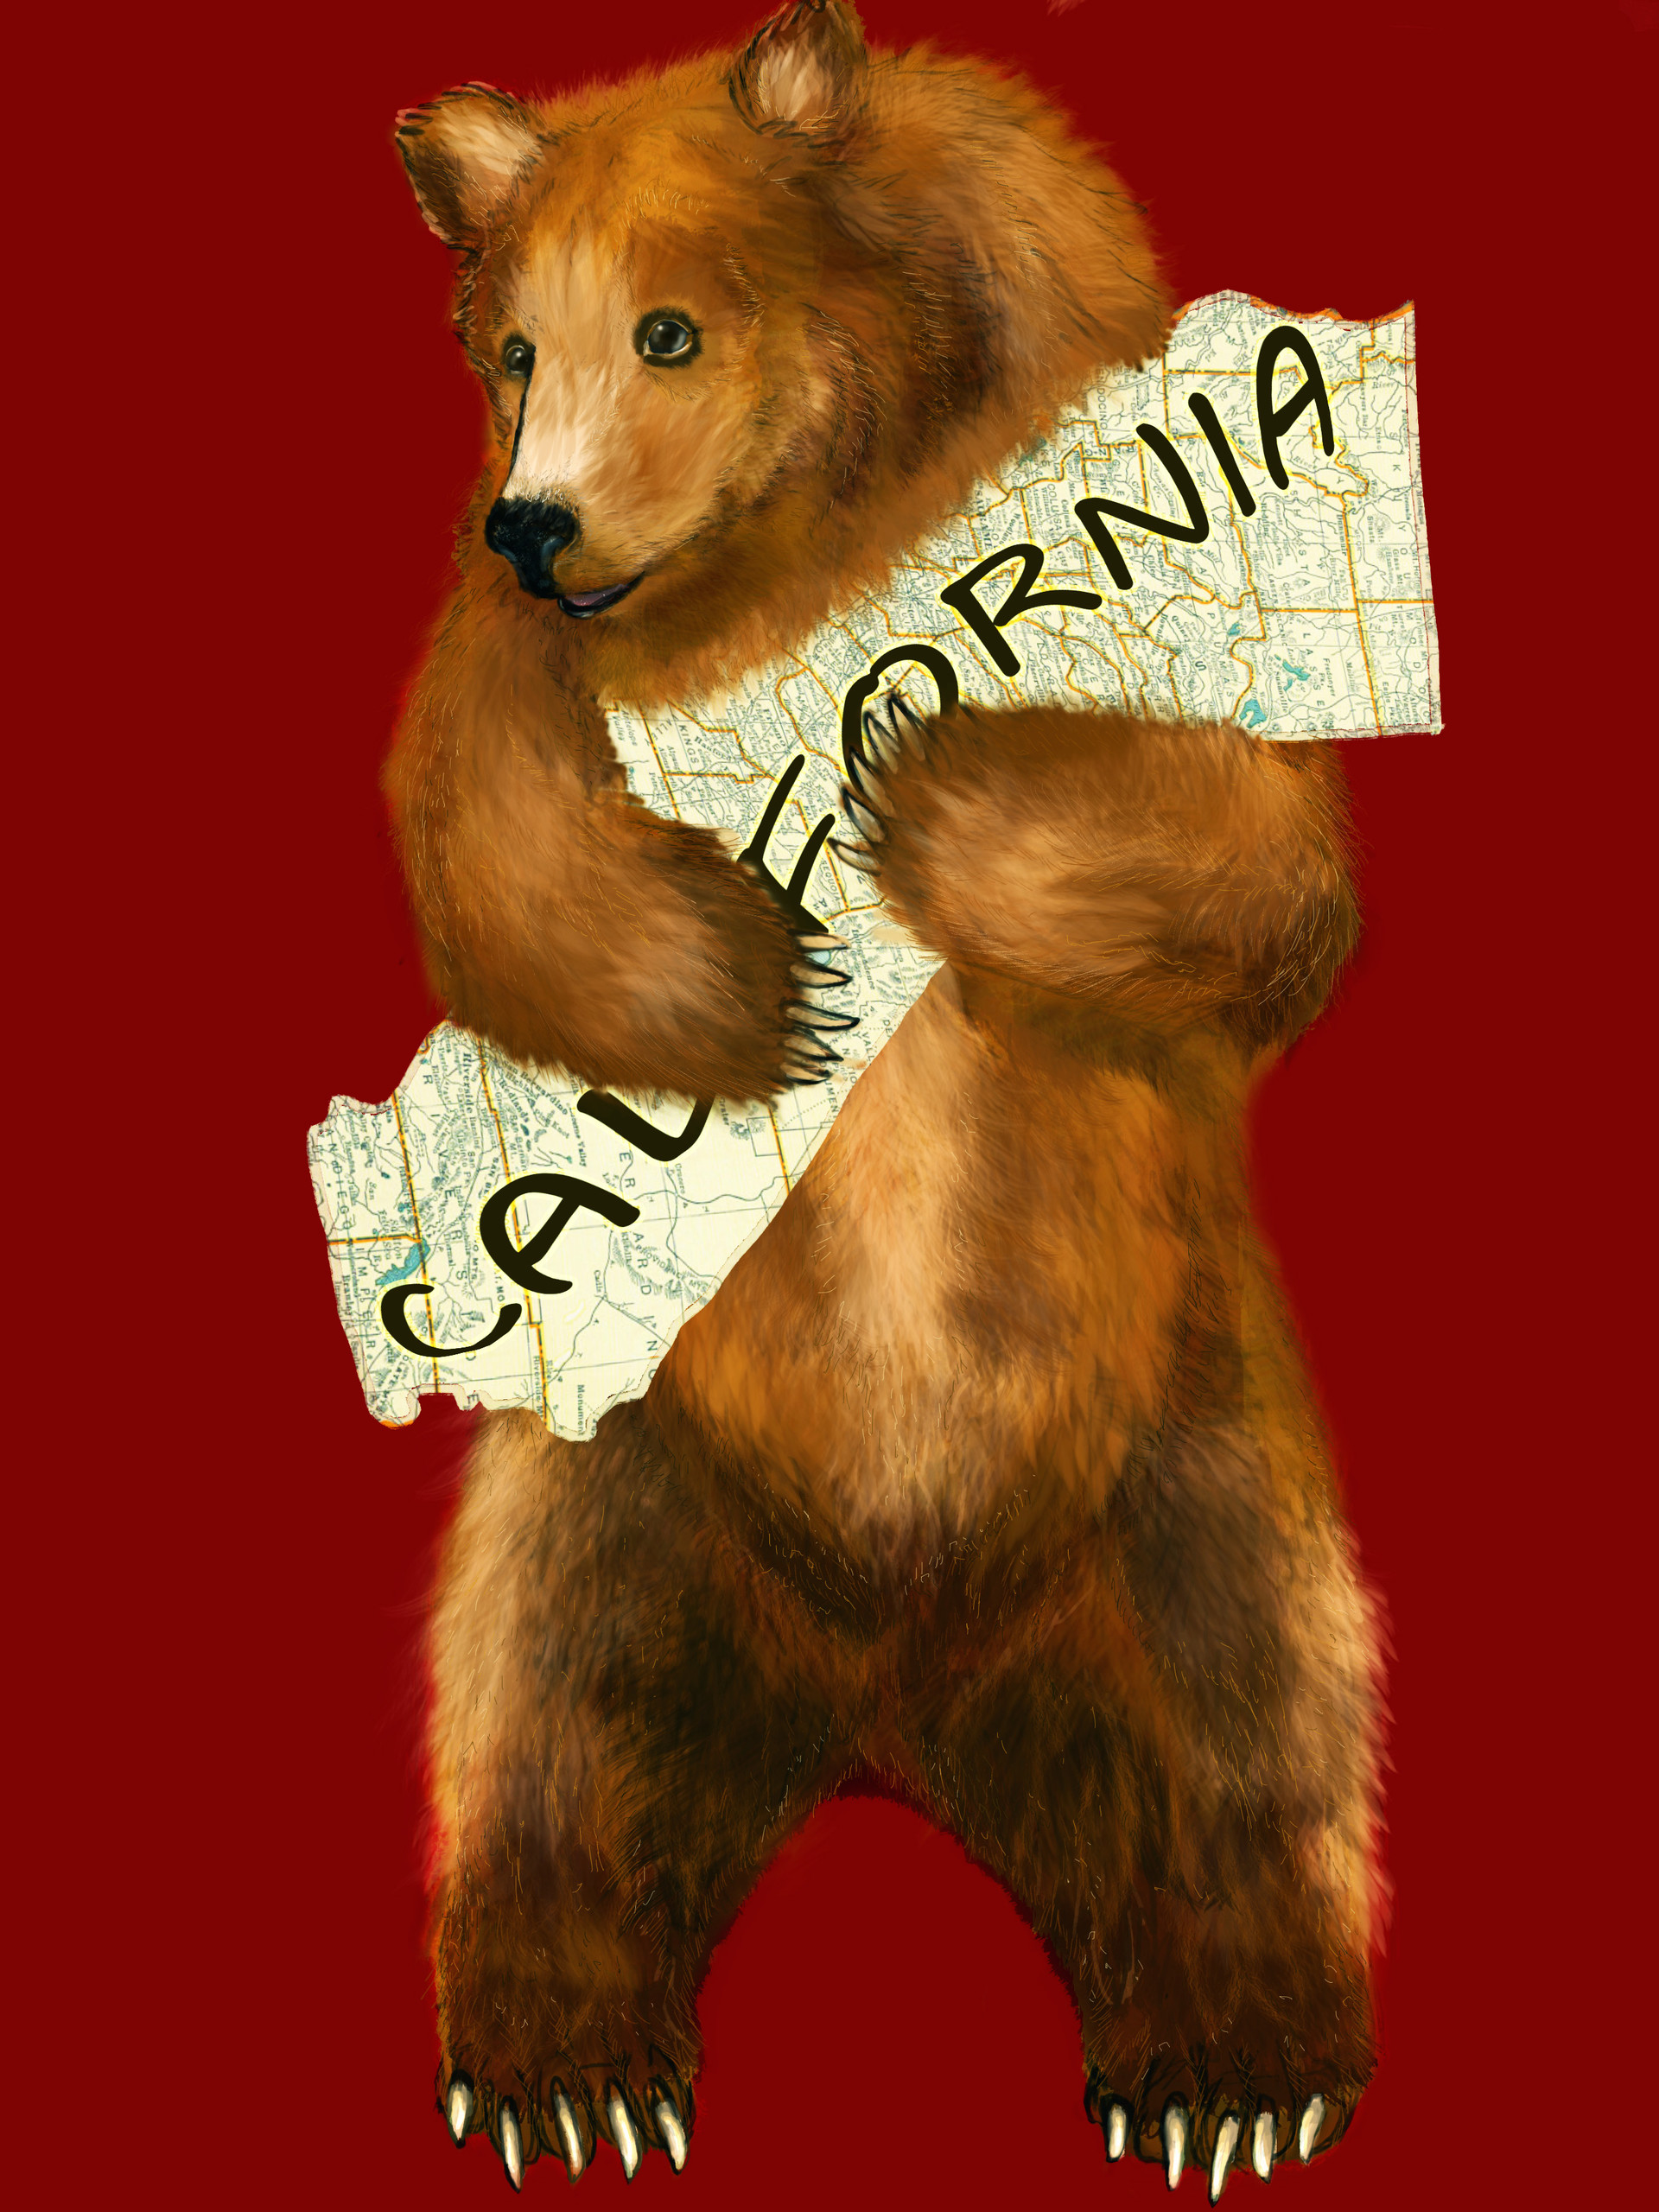 Alexandra hall pinner bear1words